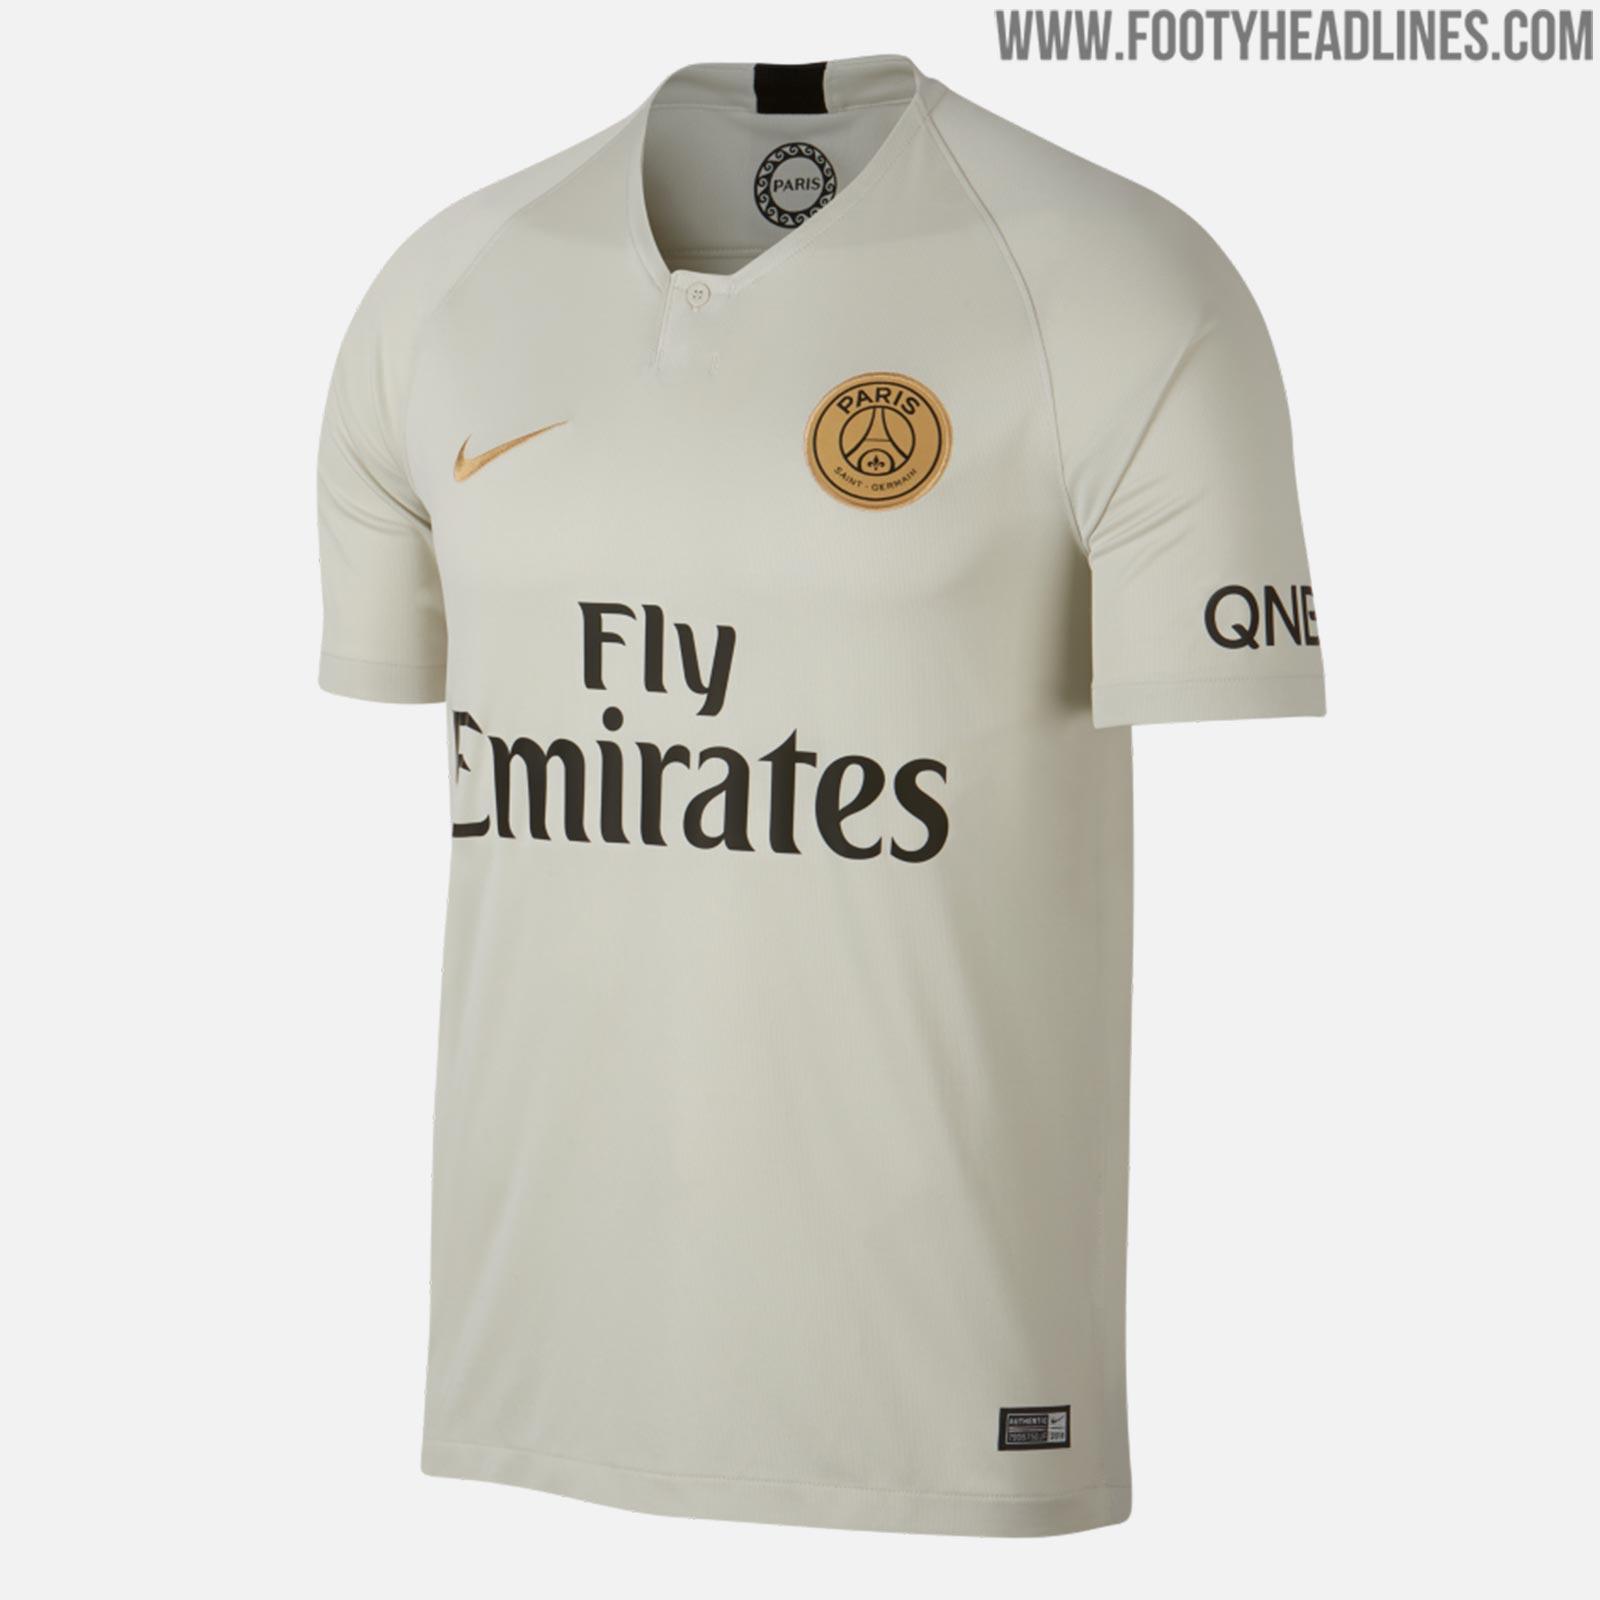 Top 10 Paris Saint-Germain Kits In History - Footy Headlines 2b65277e4